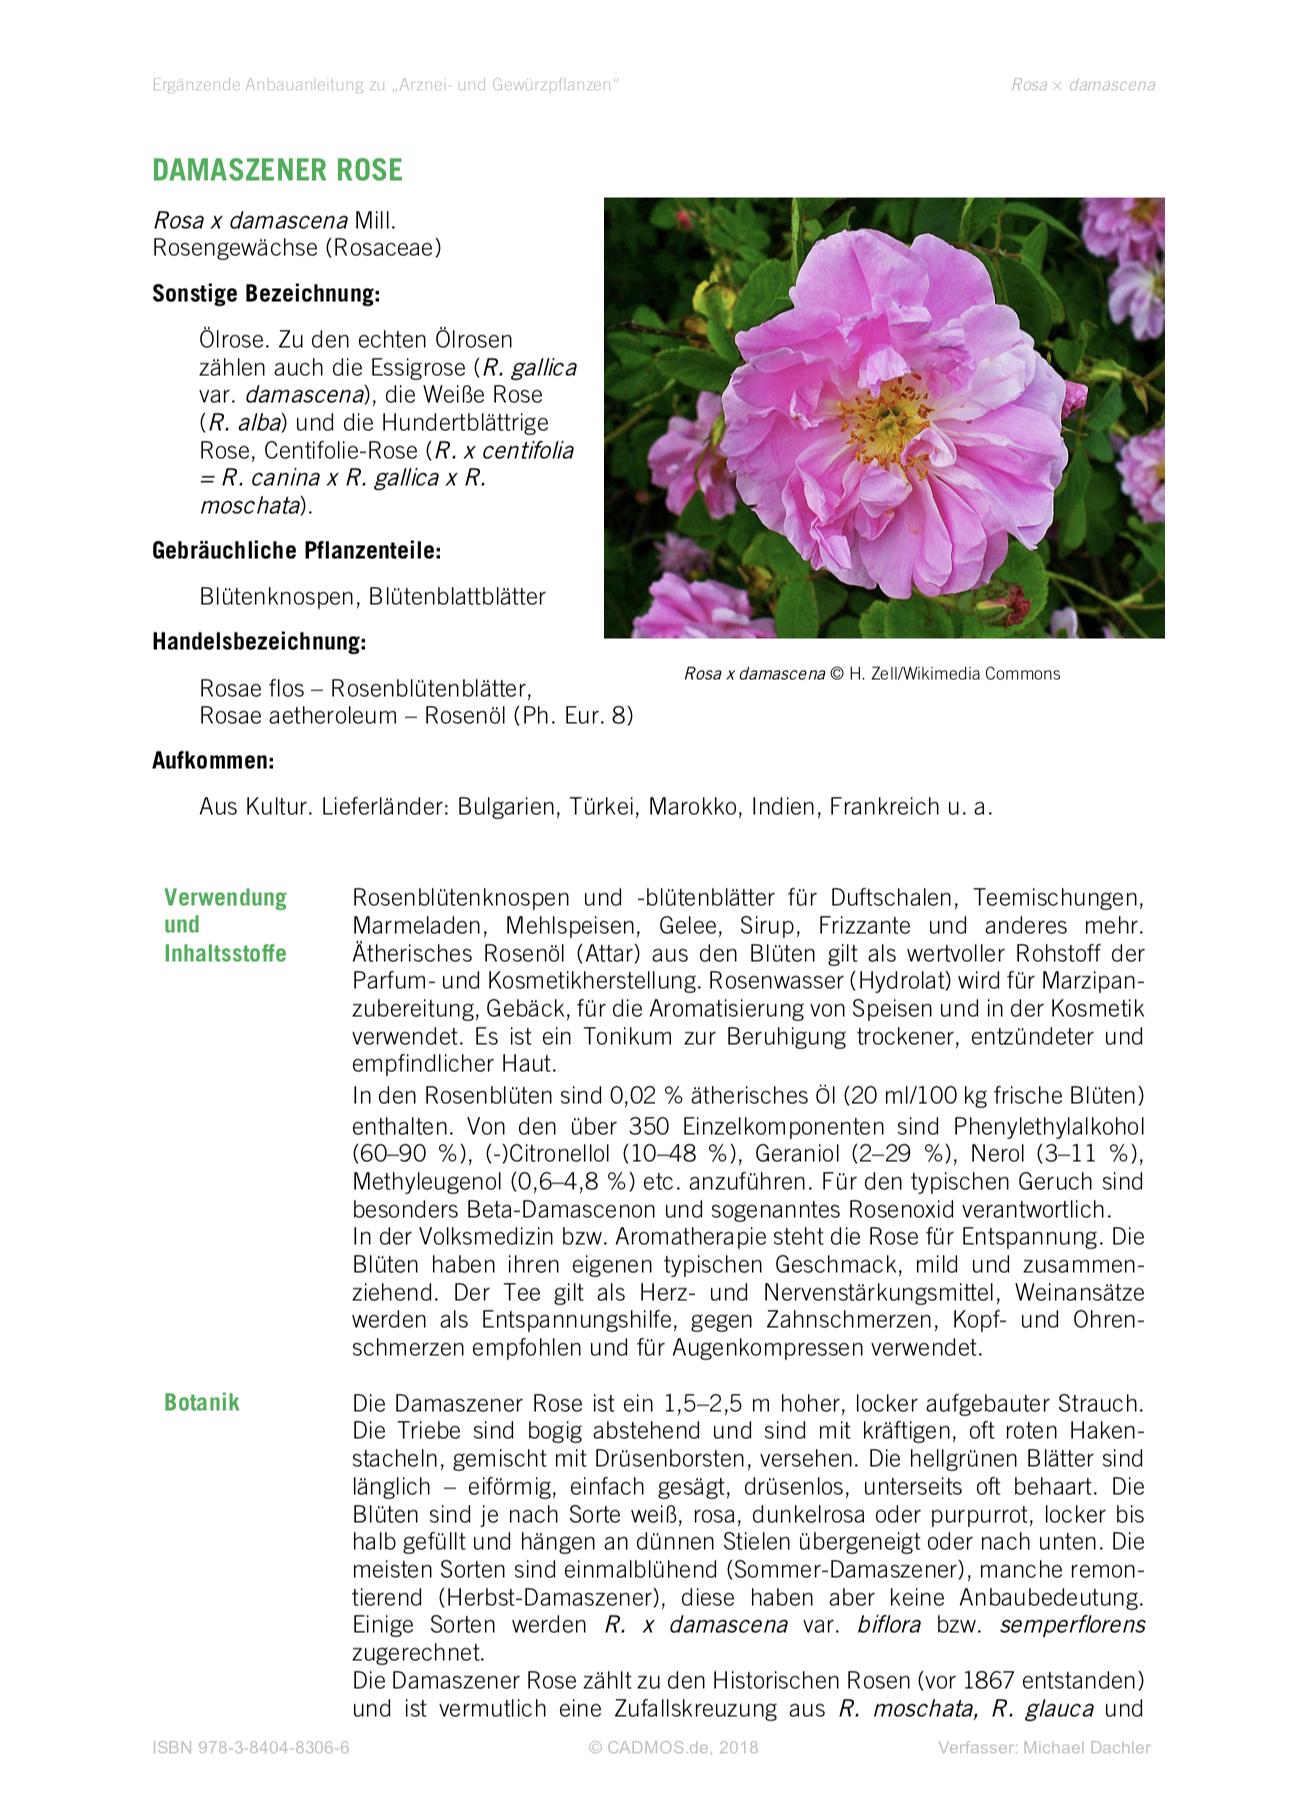 Anbauanleitung Damaszener-Rose (Rosa x damascena)